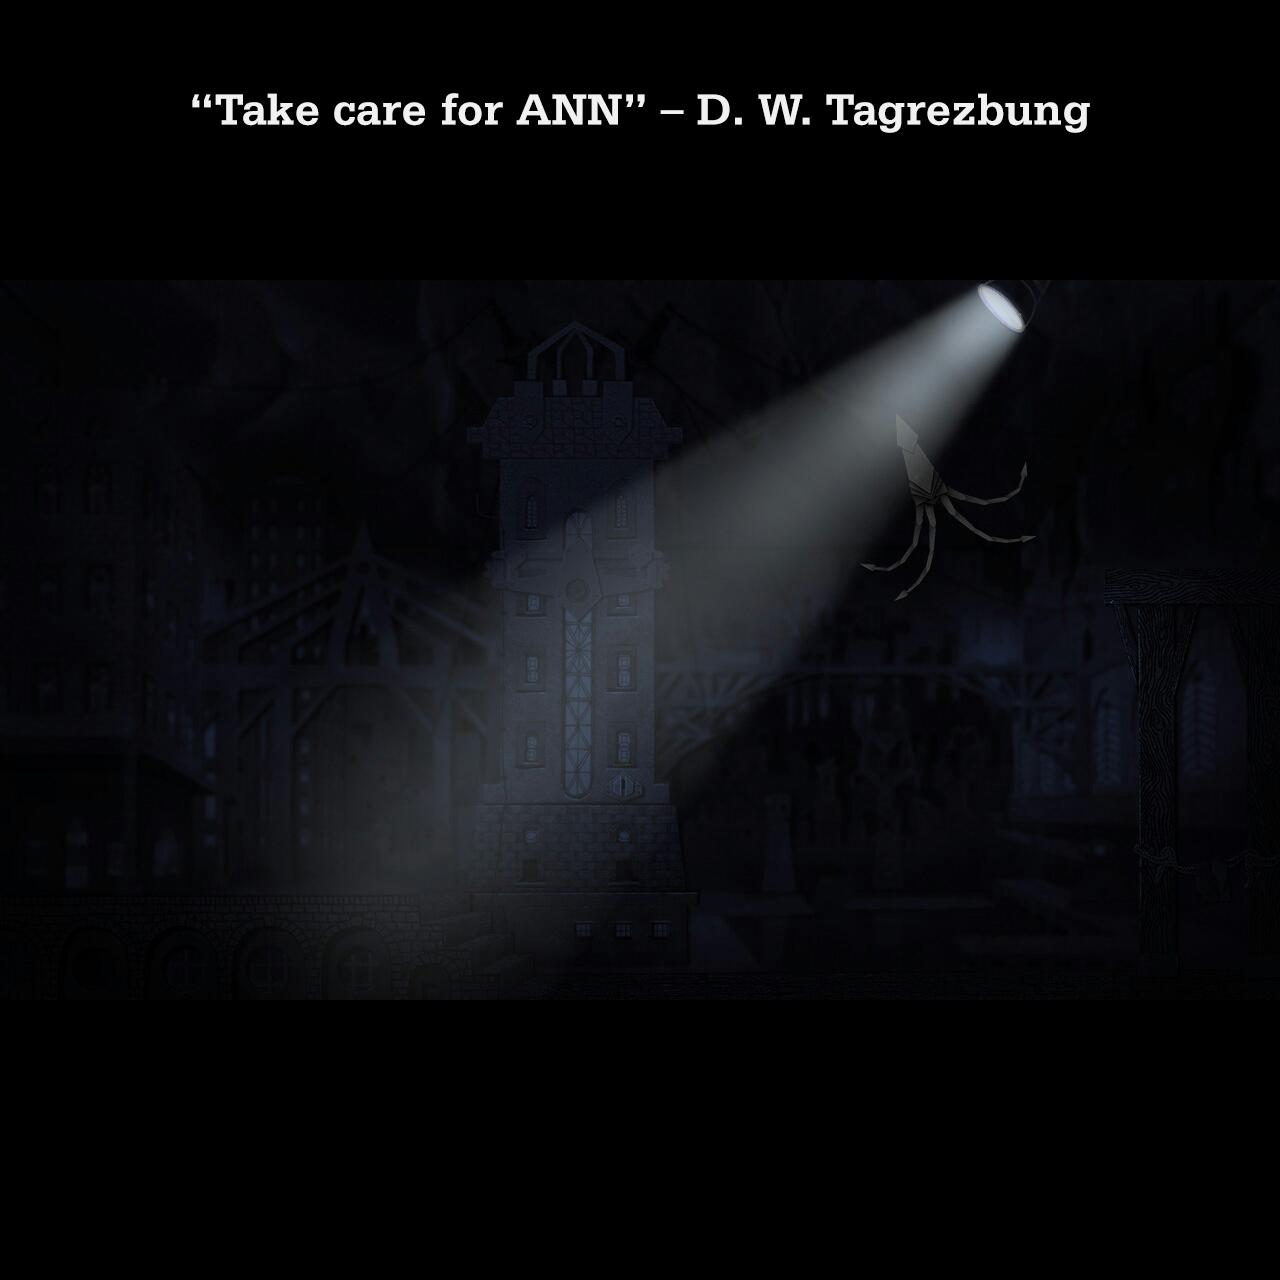 Take care for ANN